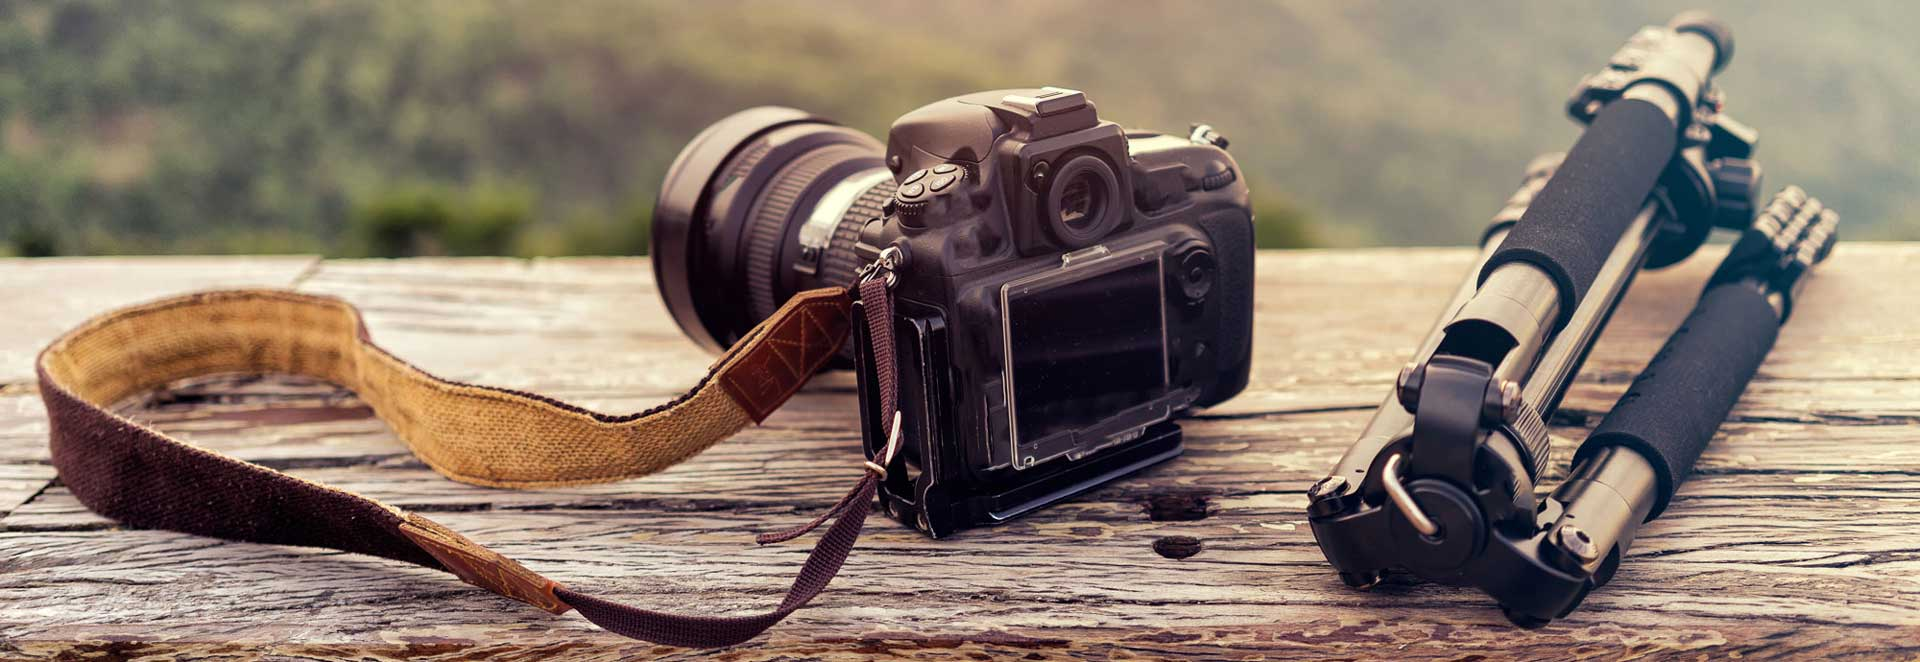 banner1 - راهنمای خرید دوربین DSLR